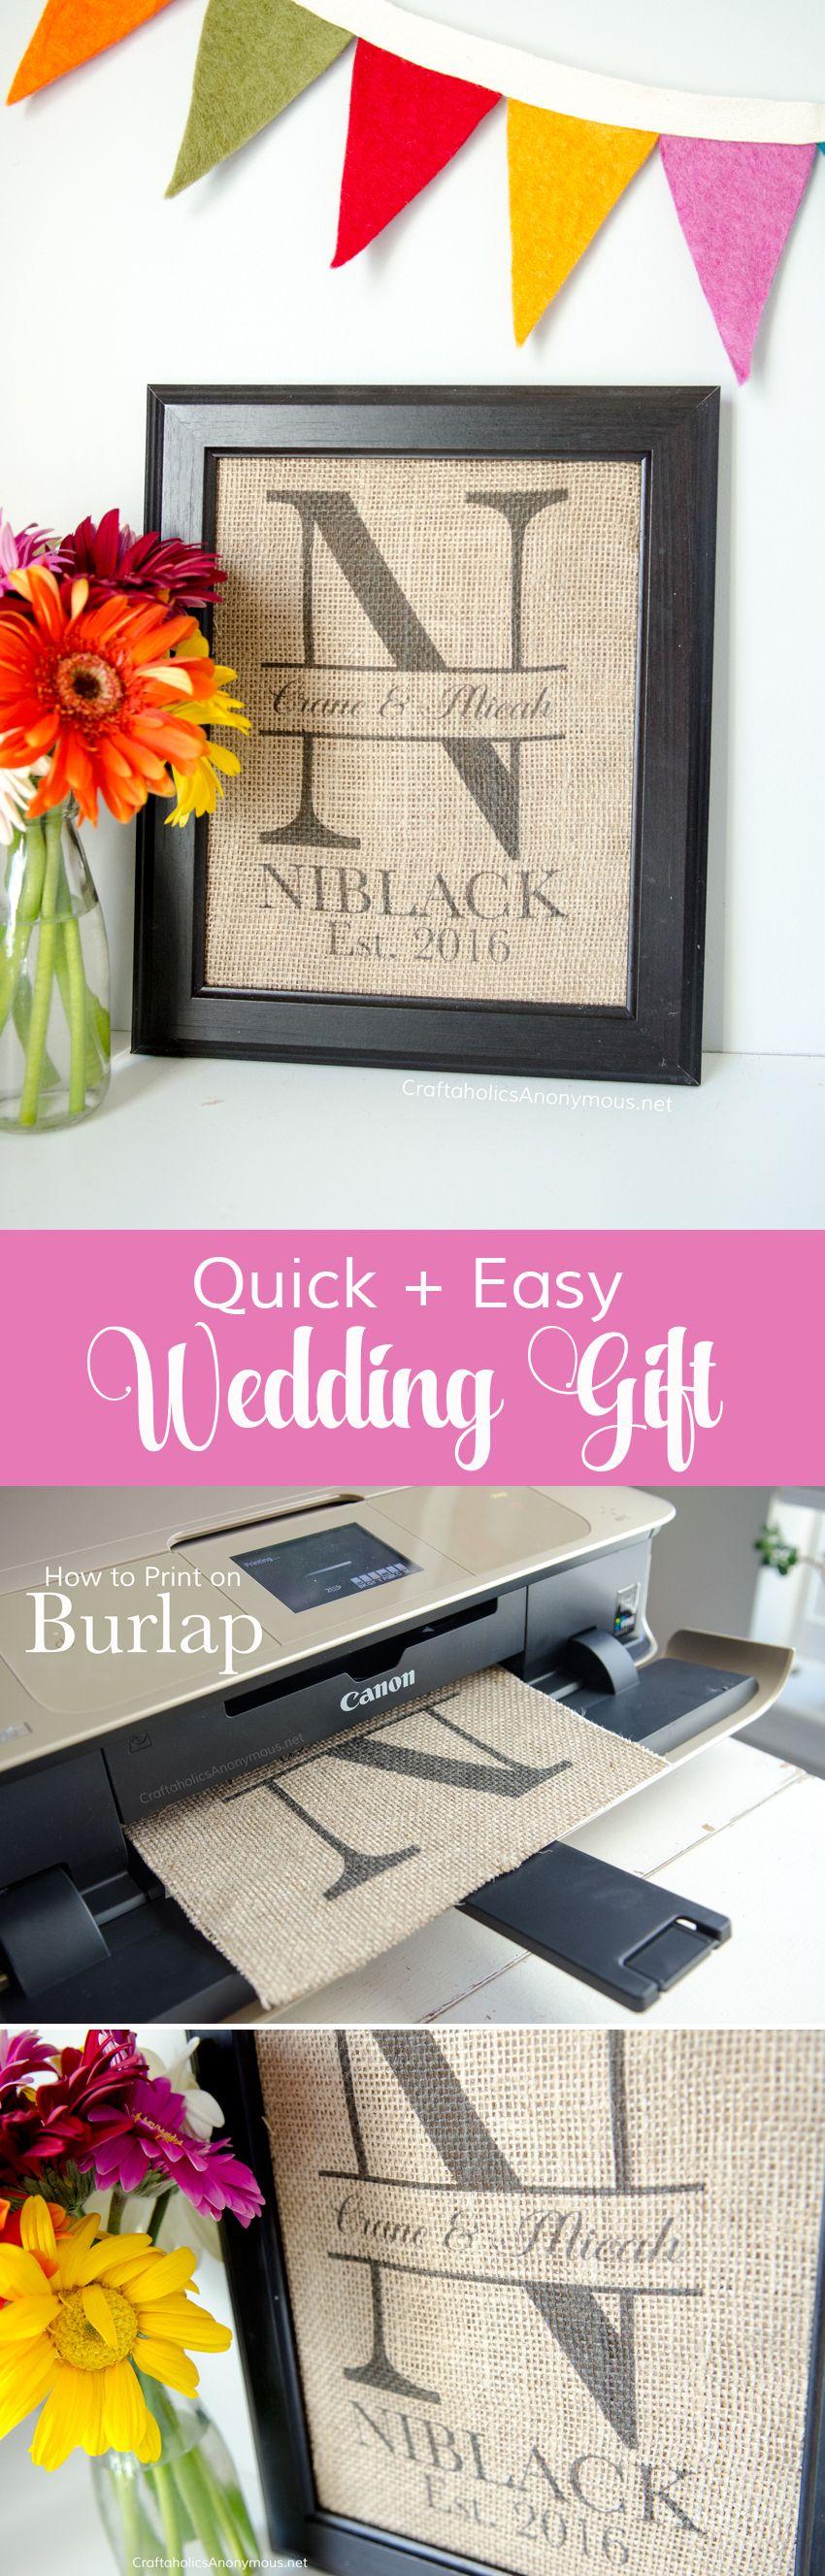 Diy monogram wedding gift idea craftaholics anonymous pinterest